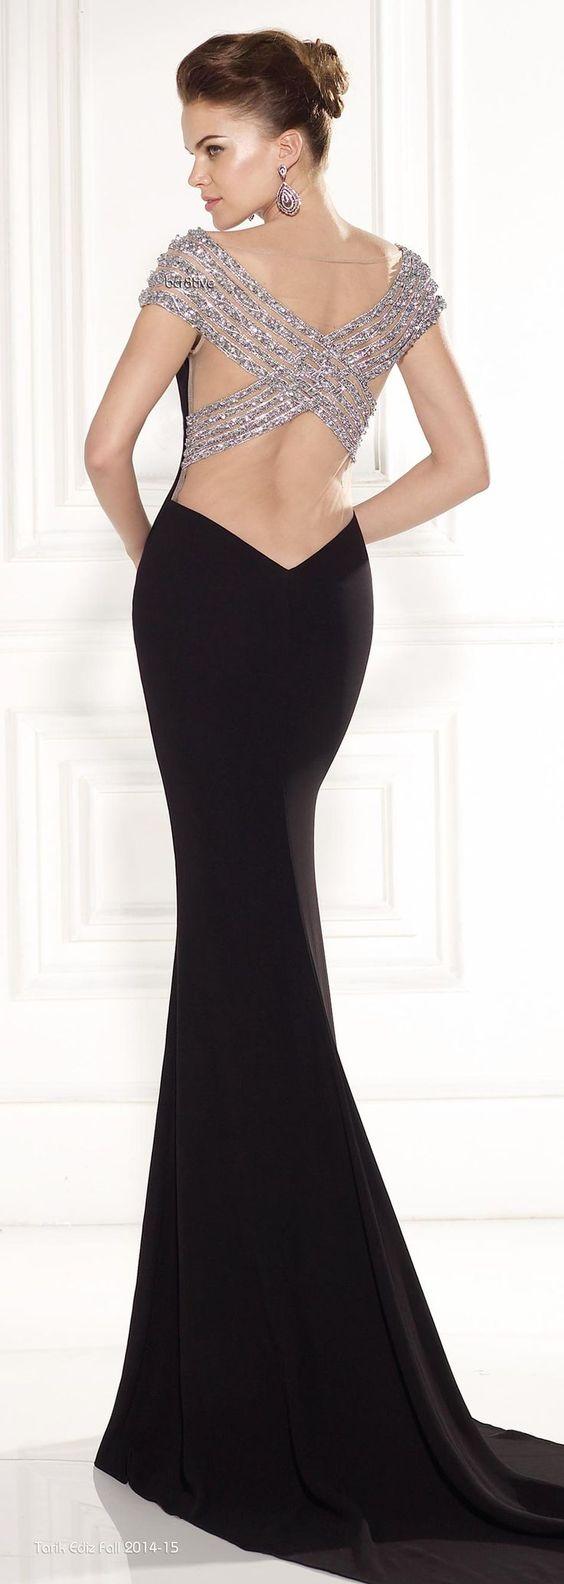 http://siempreguapaconoriflamencsad.blogspot.com/2014/10/vestidos-negros-de-noche-para-una.html: